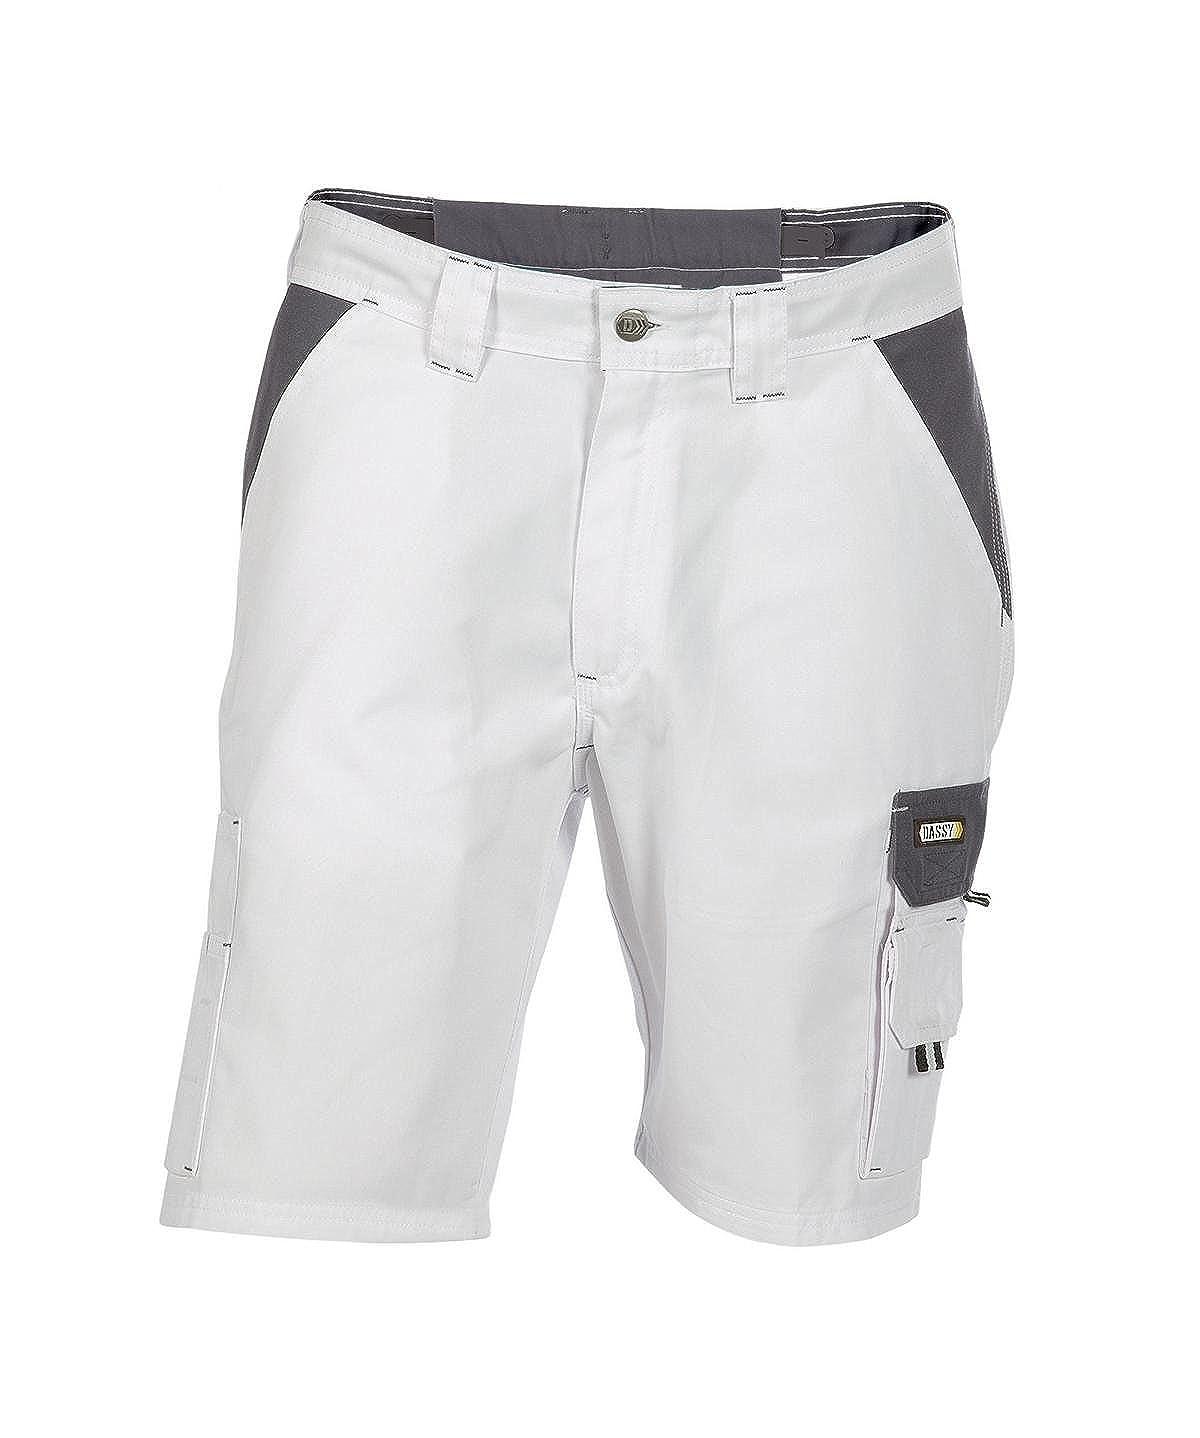 Dassy Roma wei/ß//grau Arbeitshose Bundhose Shorts Bermuda